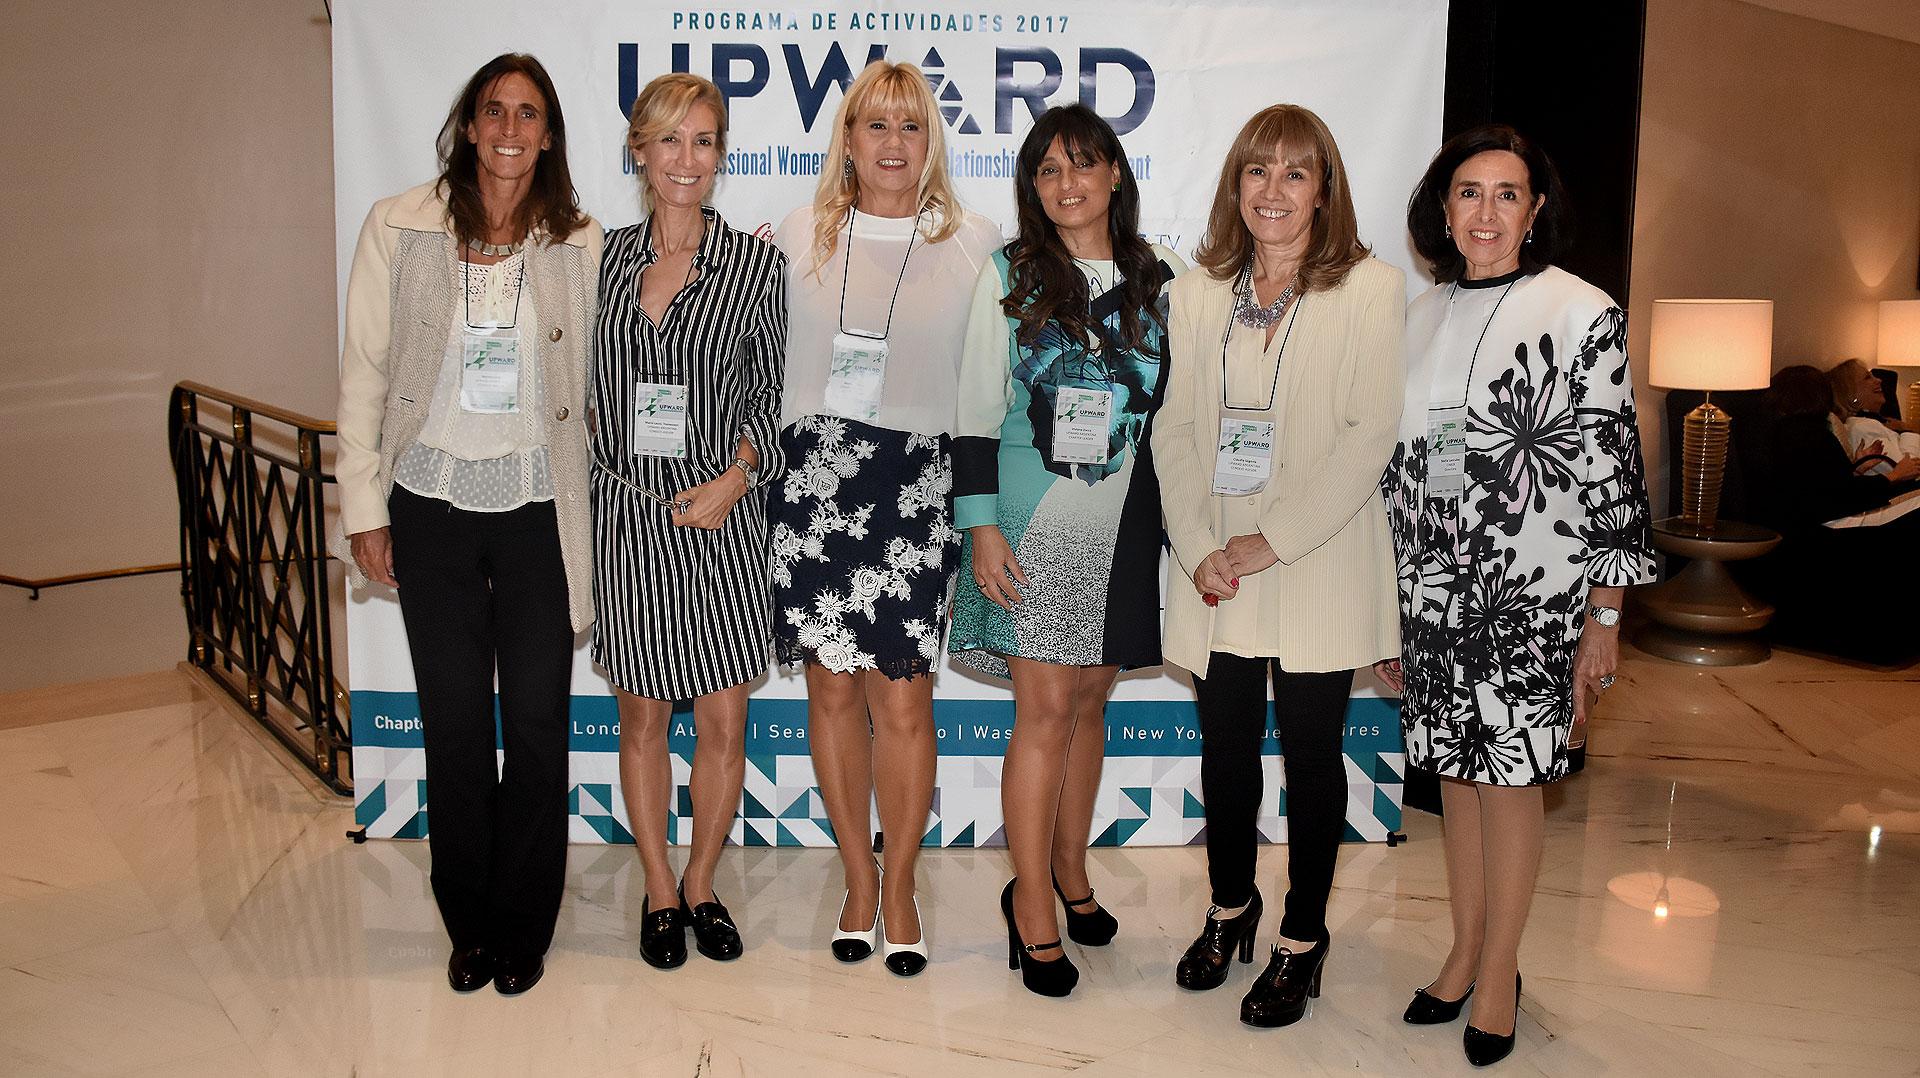 Mariana Feld, María Laura Tramezzani, Marcela Losardo, Viviana Zocco, Claudia Segovia y Stella Lancuba